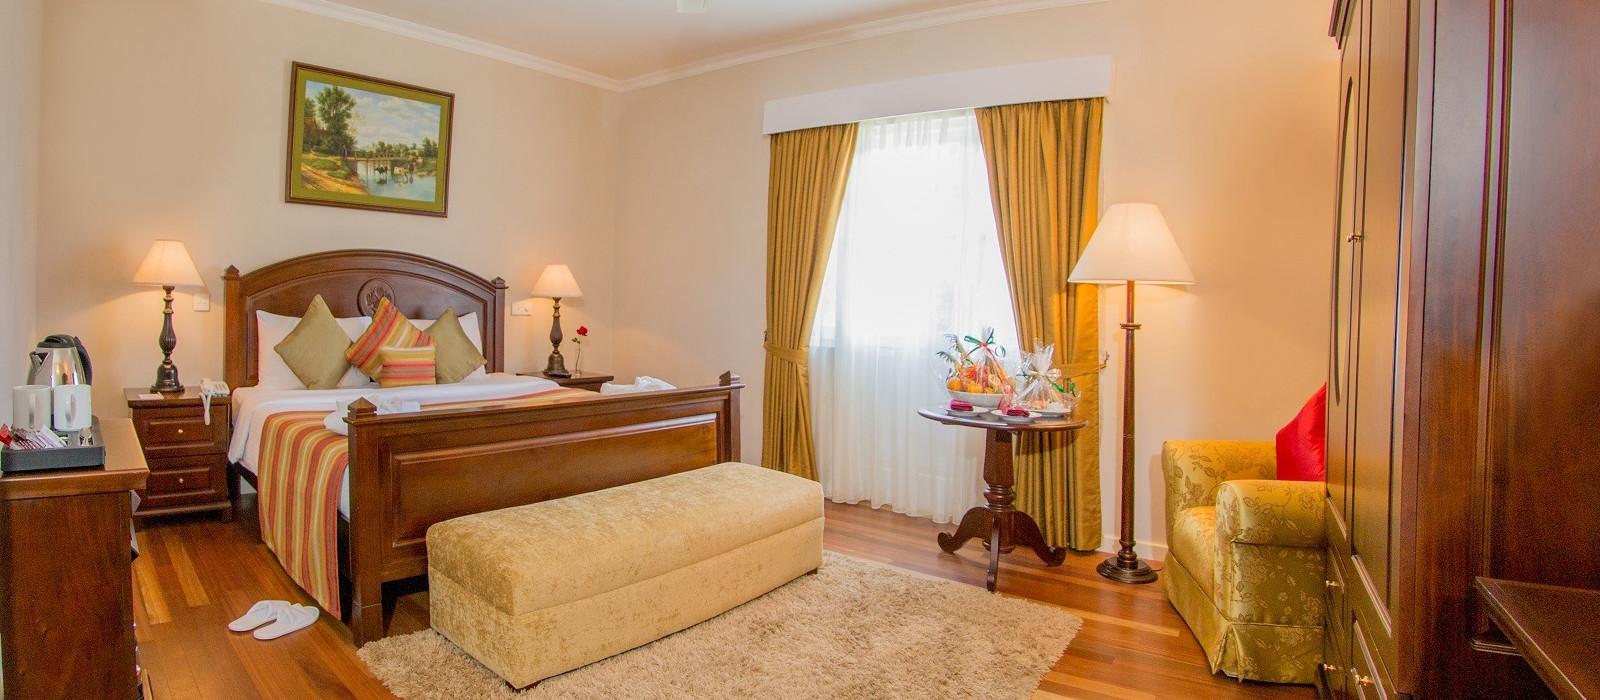 Hotel Langdale bei Amaya Sri Lanka